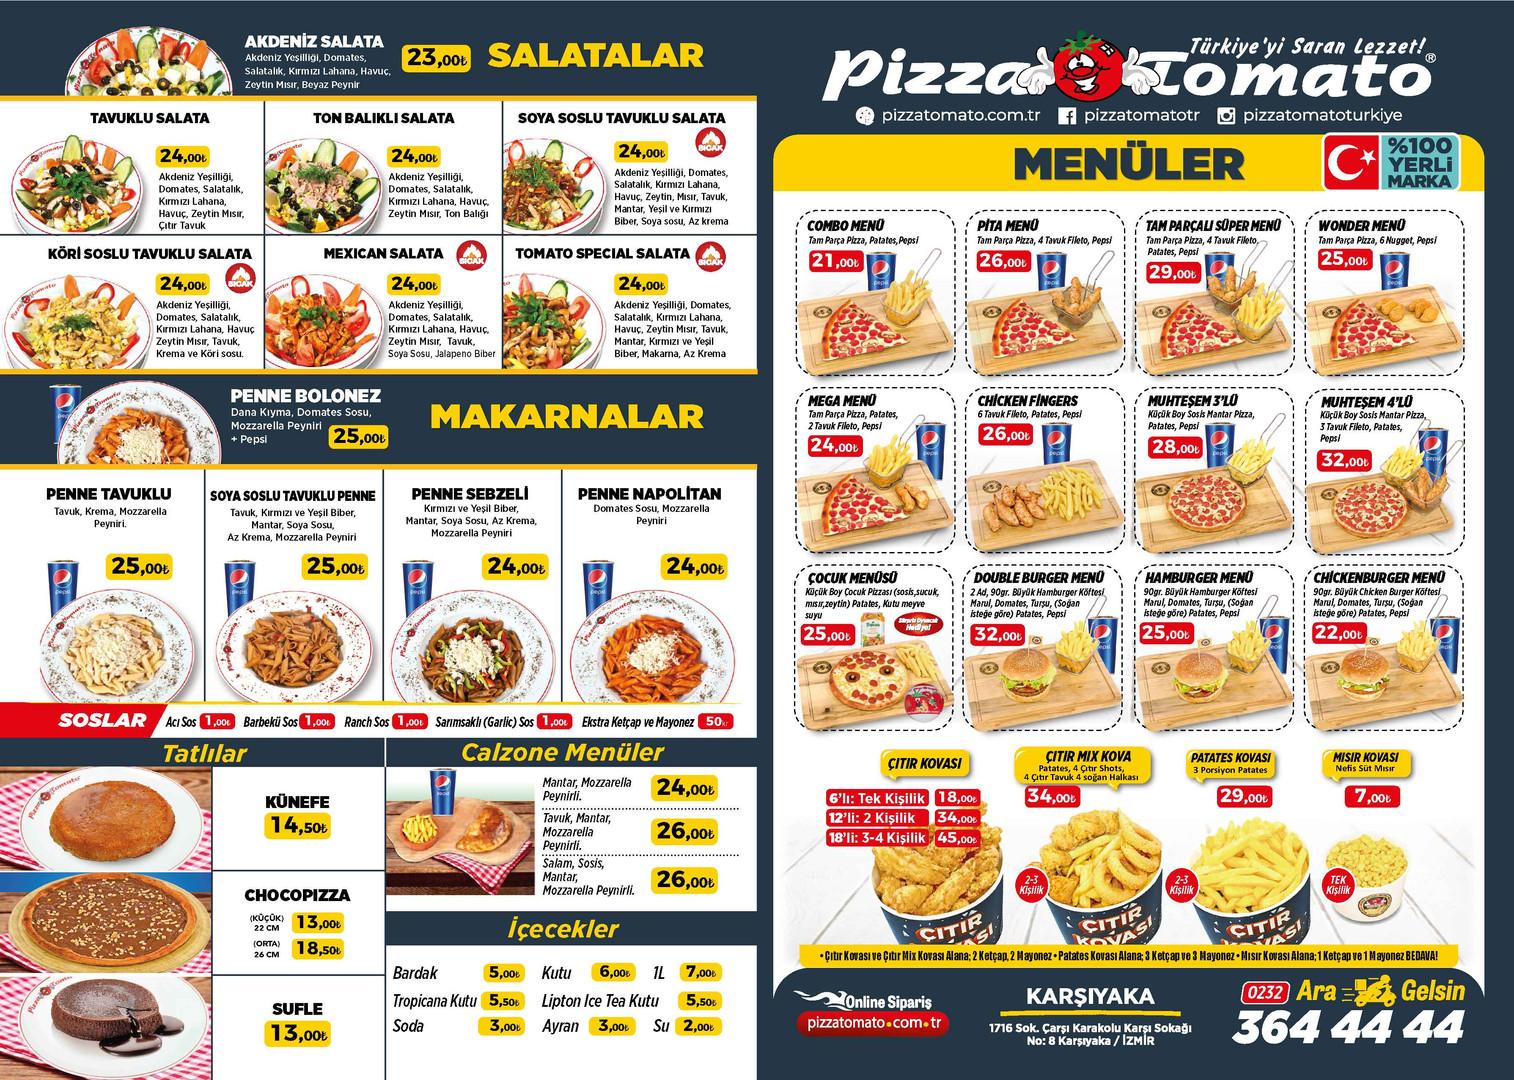 pizza-tomato-karsiyaka-kampanya.jpg